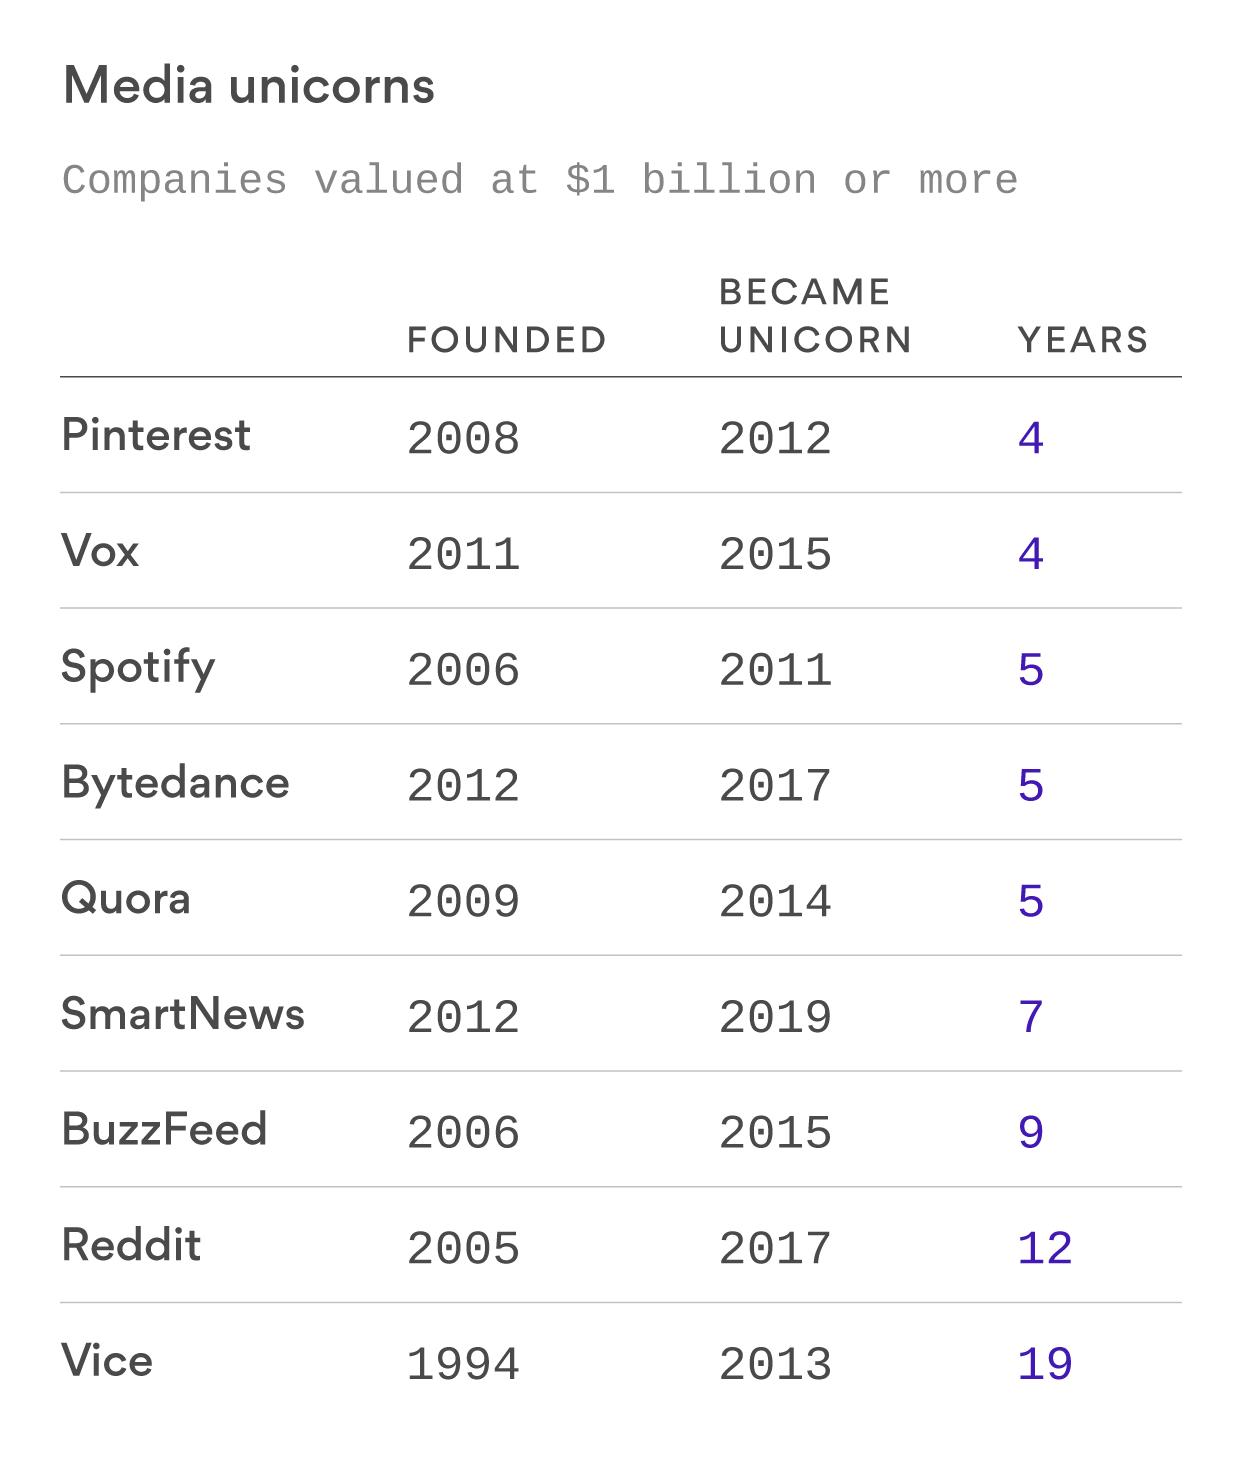 An exclusive club of media unicorns survives media industry turmoil